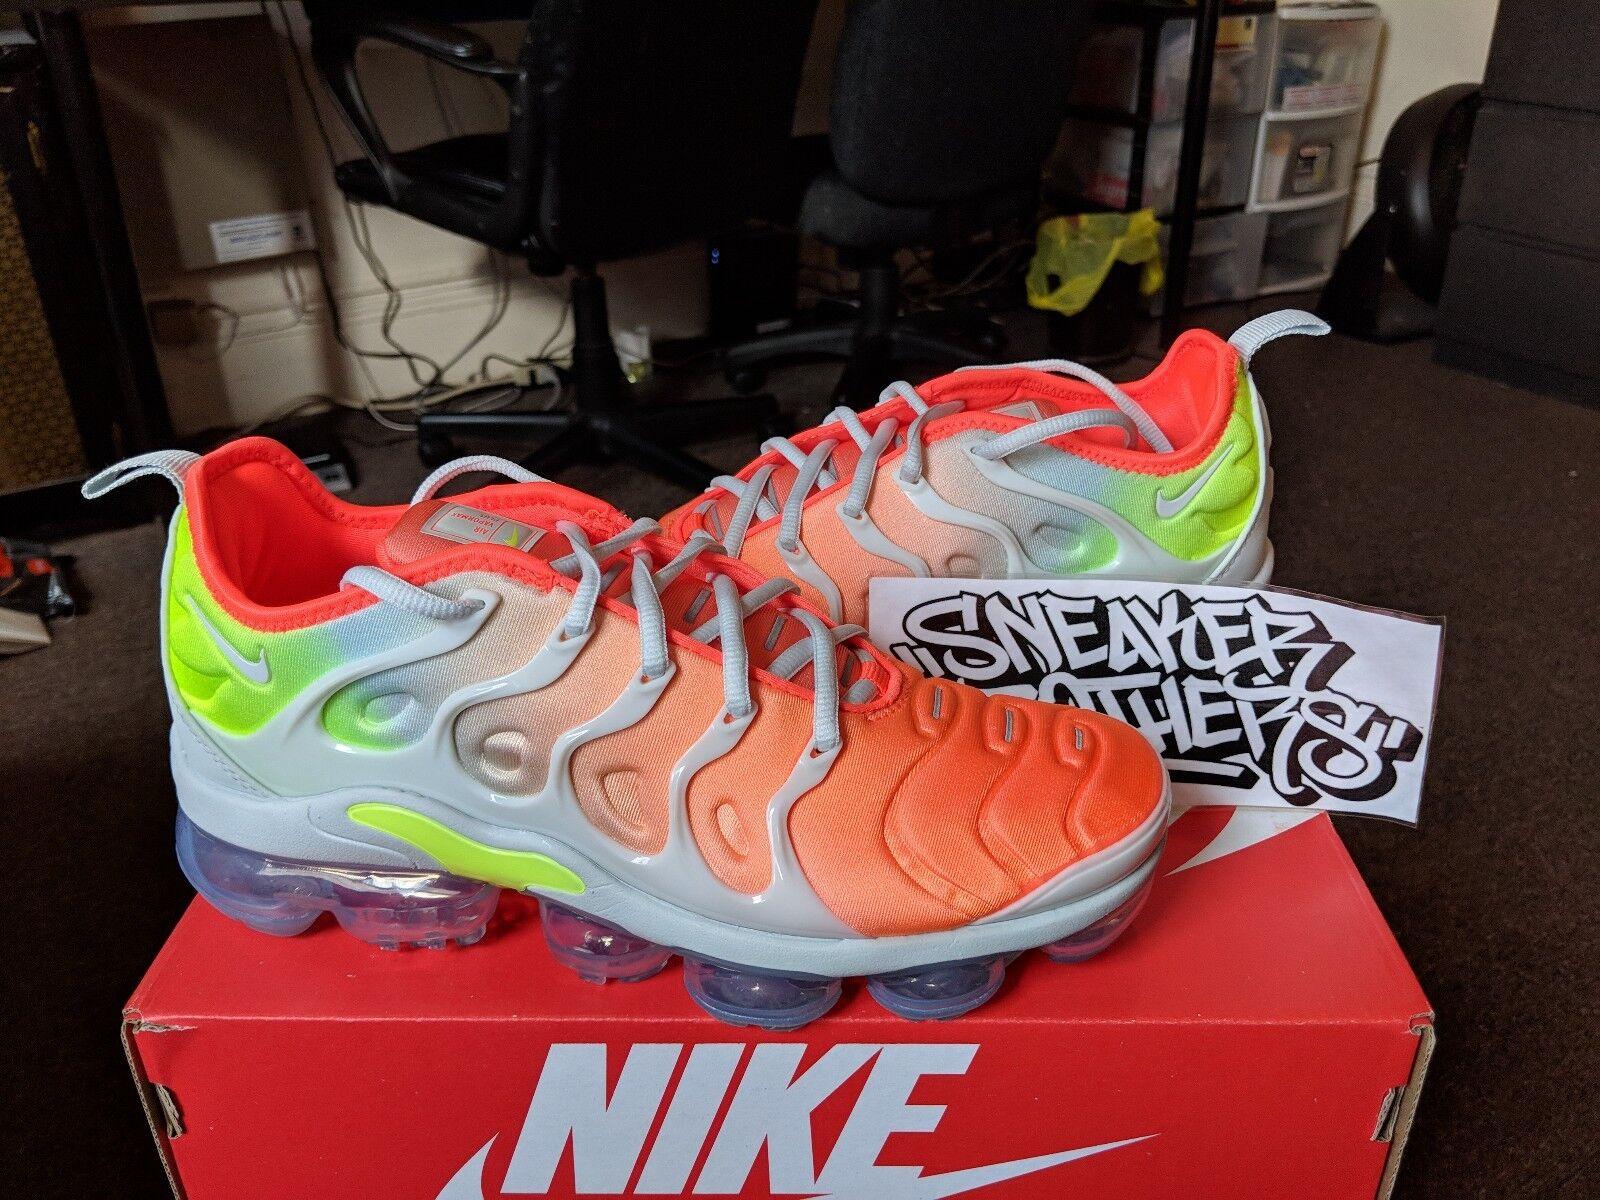 Nike Nike Nike W Air Vapormax Plus Barely Grey Reverse Sunset Volt Neon Crimson AO4550-003 1ff70e